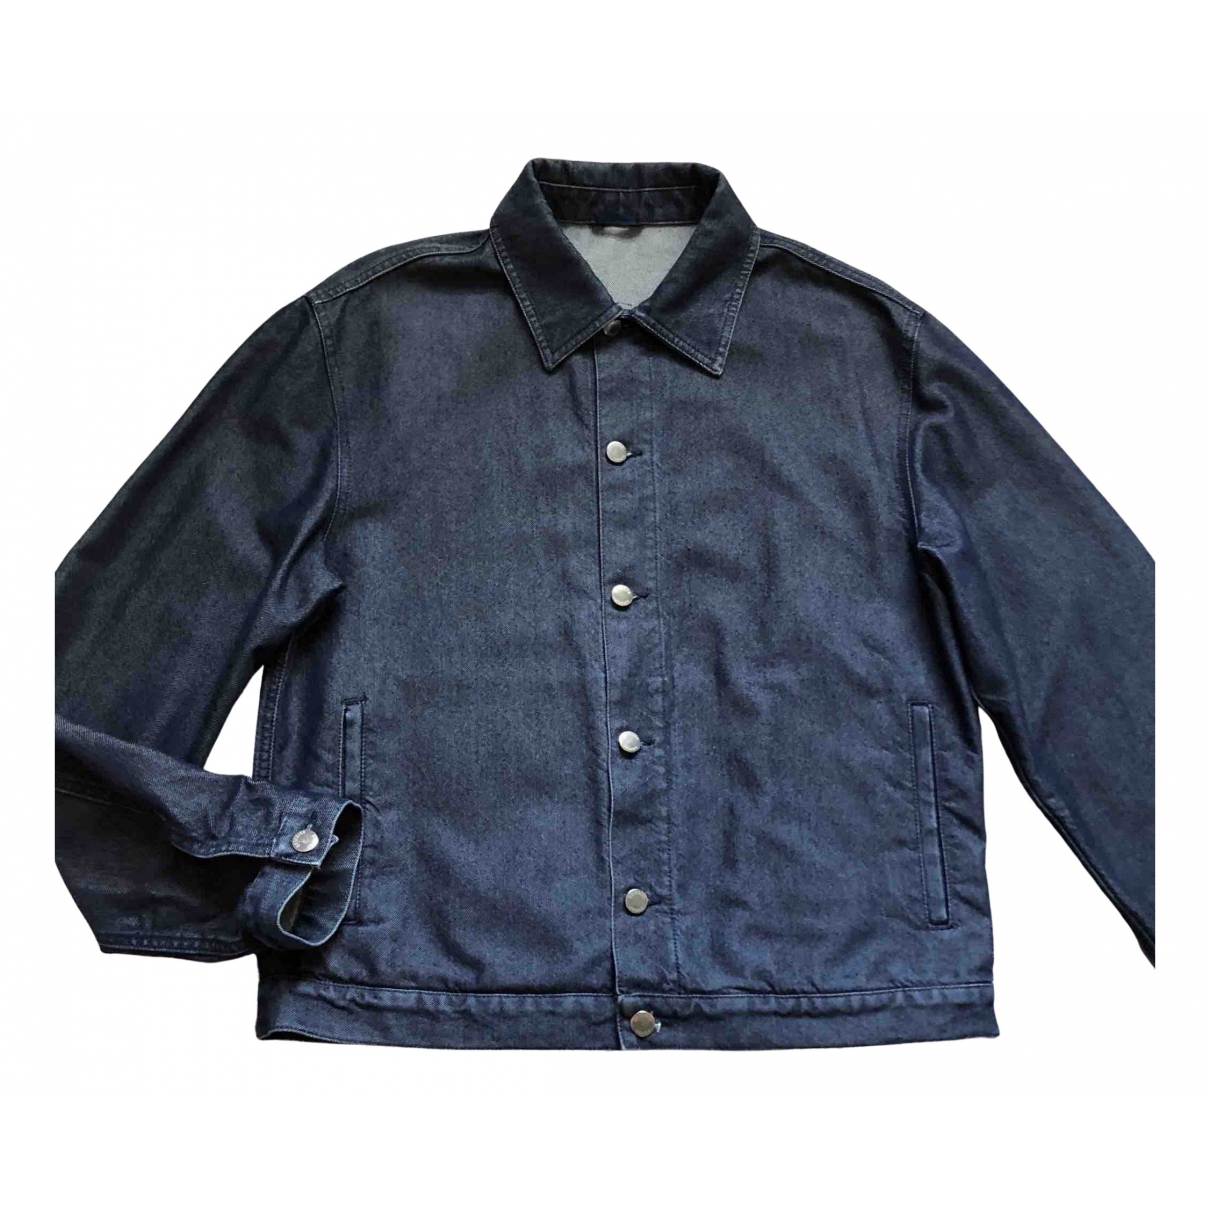 Moschino N Blue Denim - Jeans jacket  for Men 42 UK - US